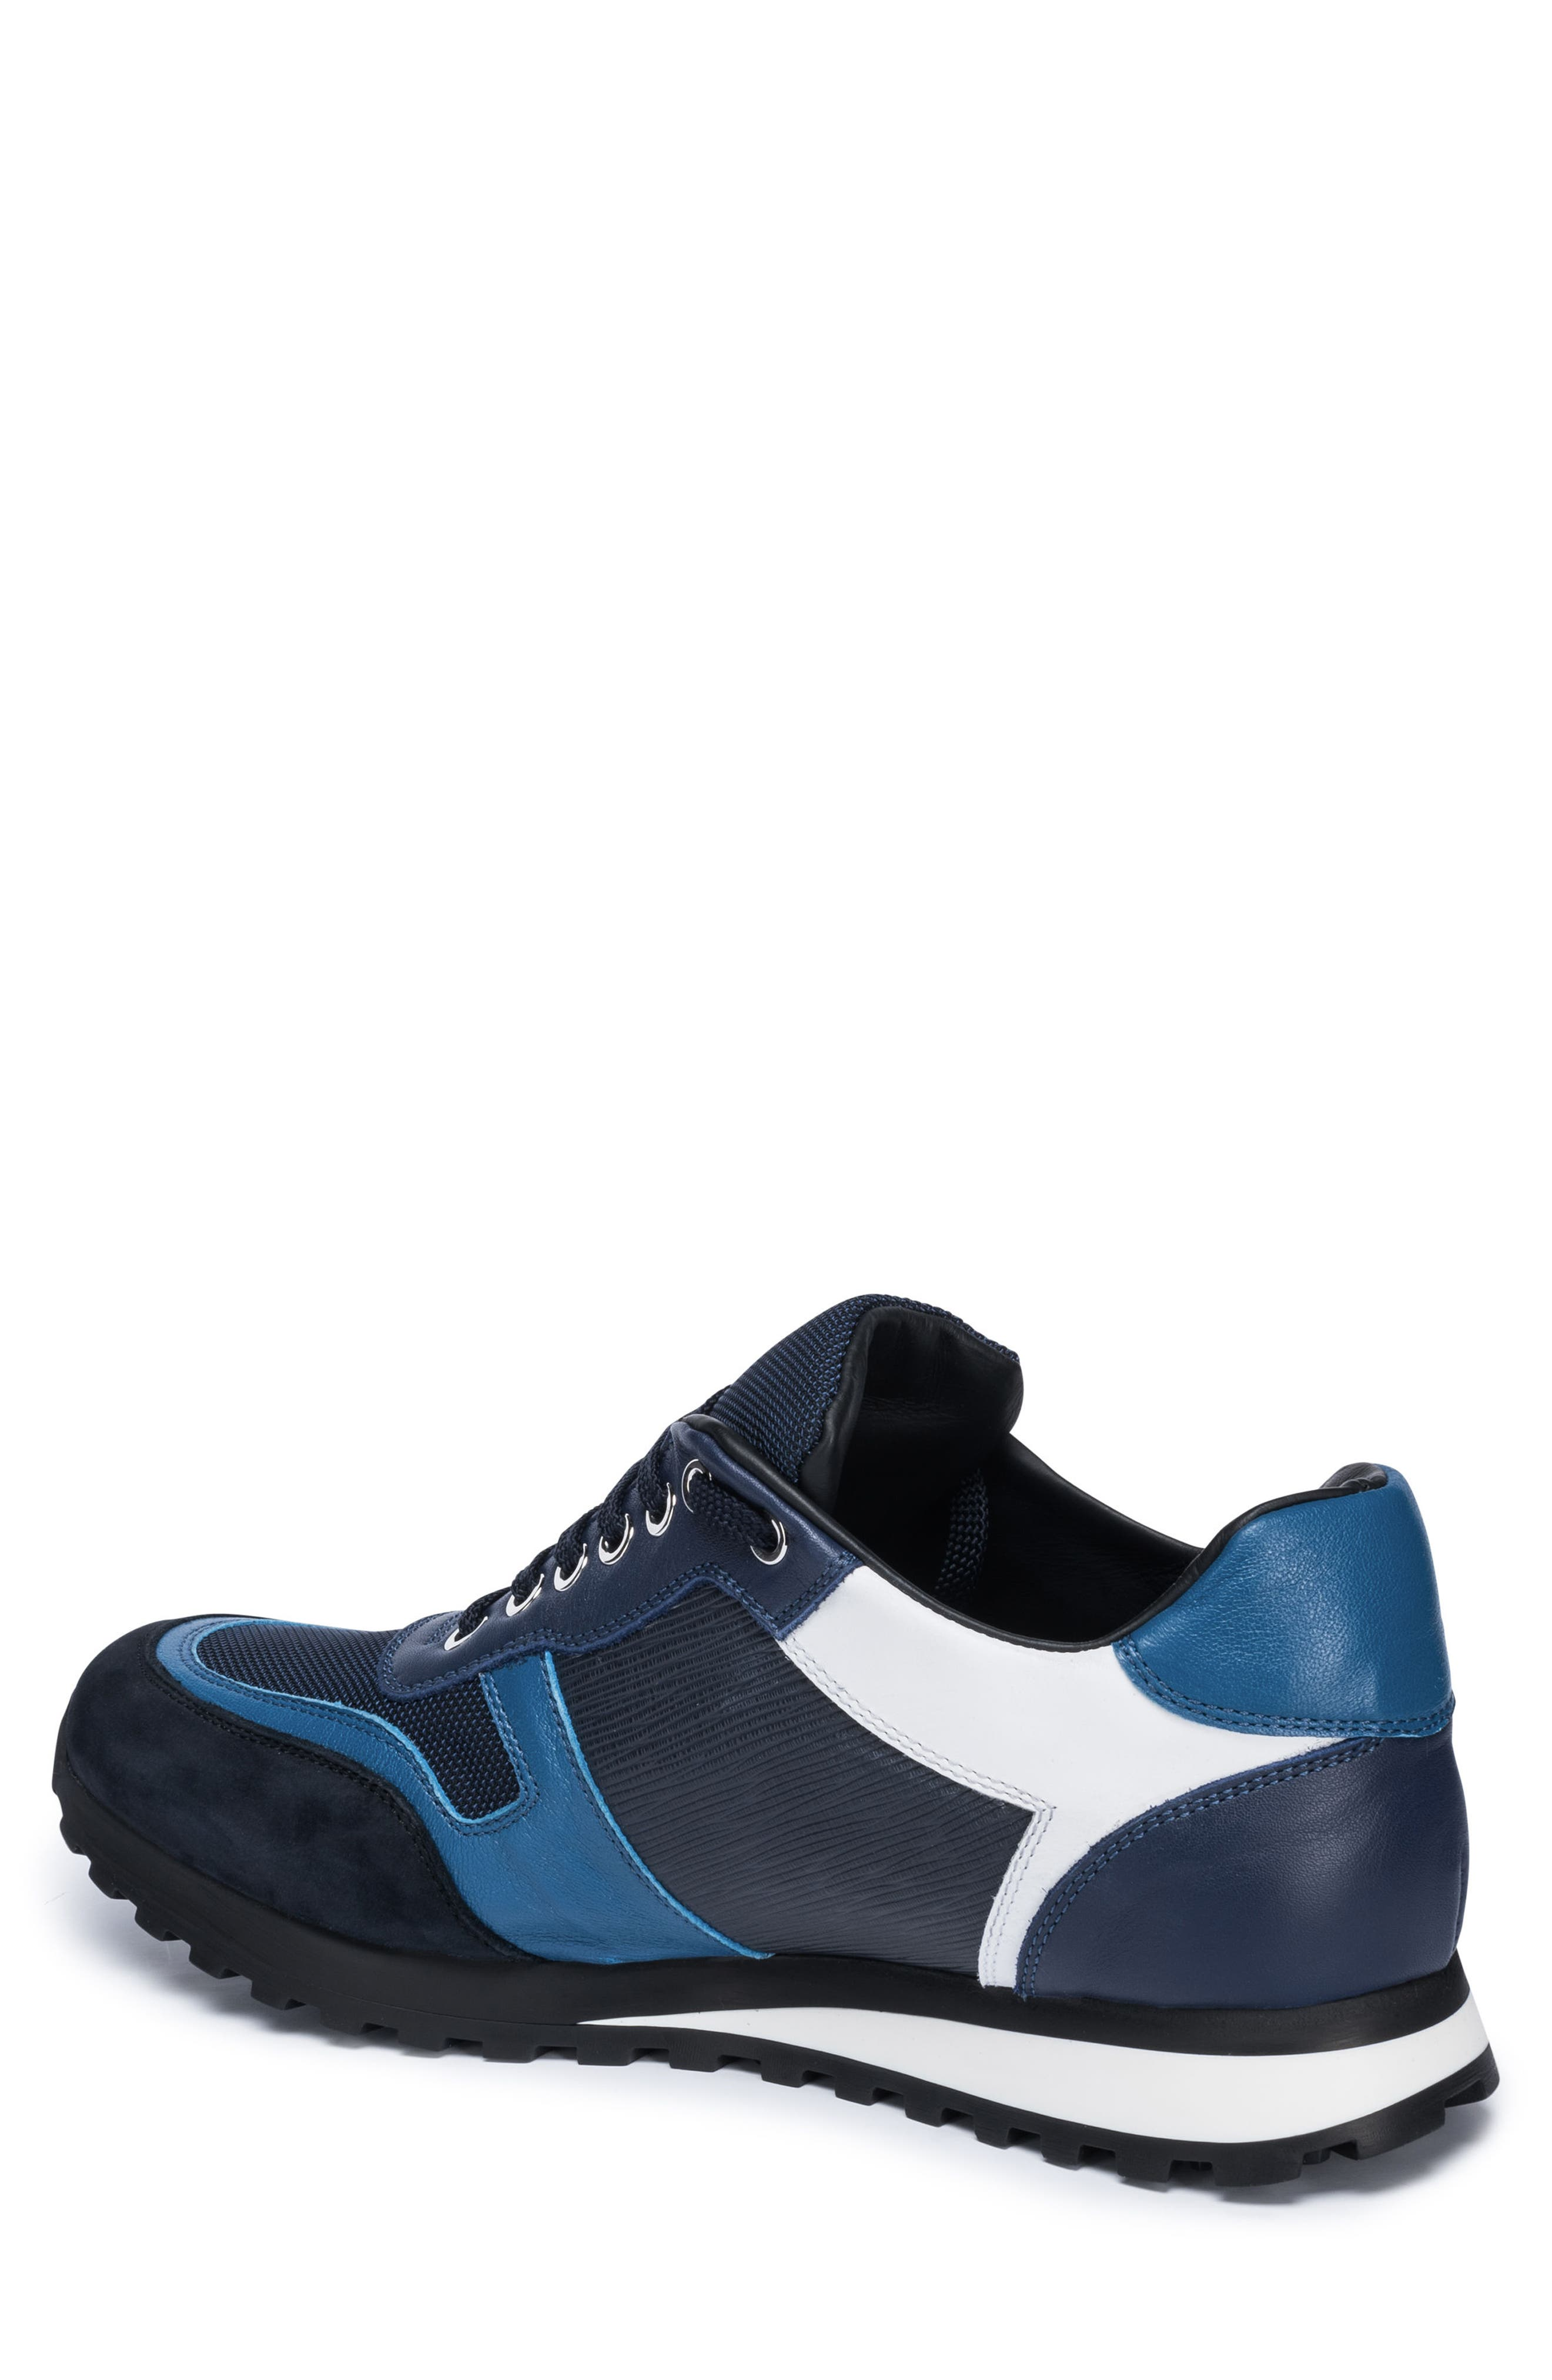 Modena Sneaker,                             Alternate thumbnail 2, color,                             Blue